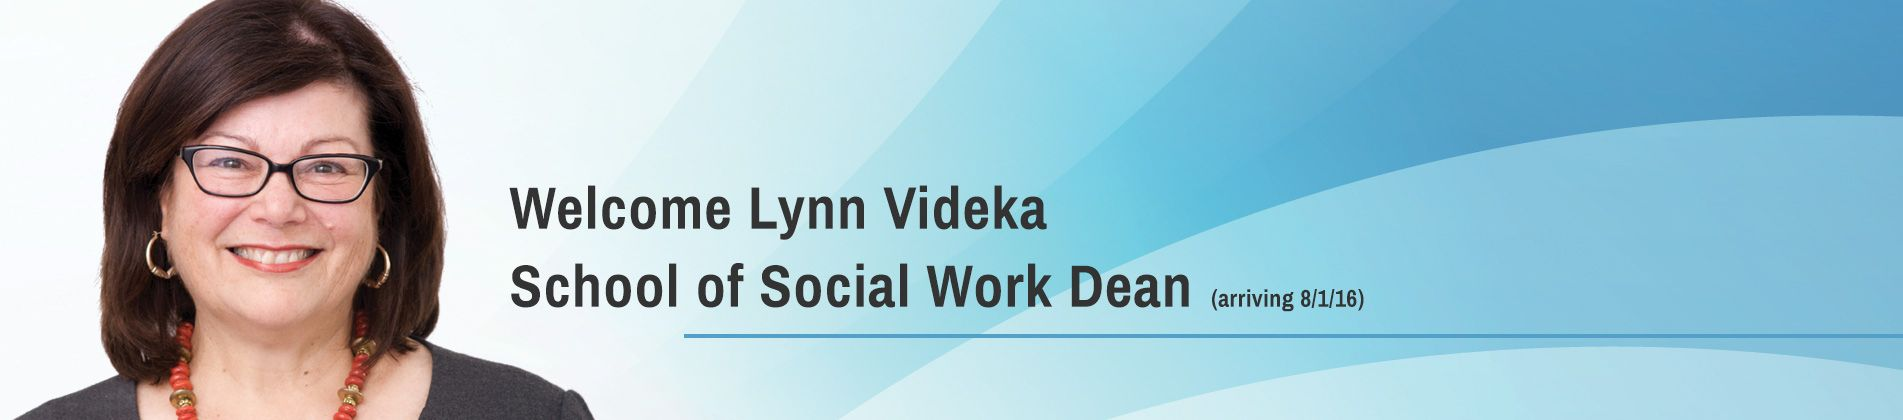 Welcome Lynn Videka School of Social Work Dean